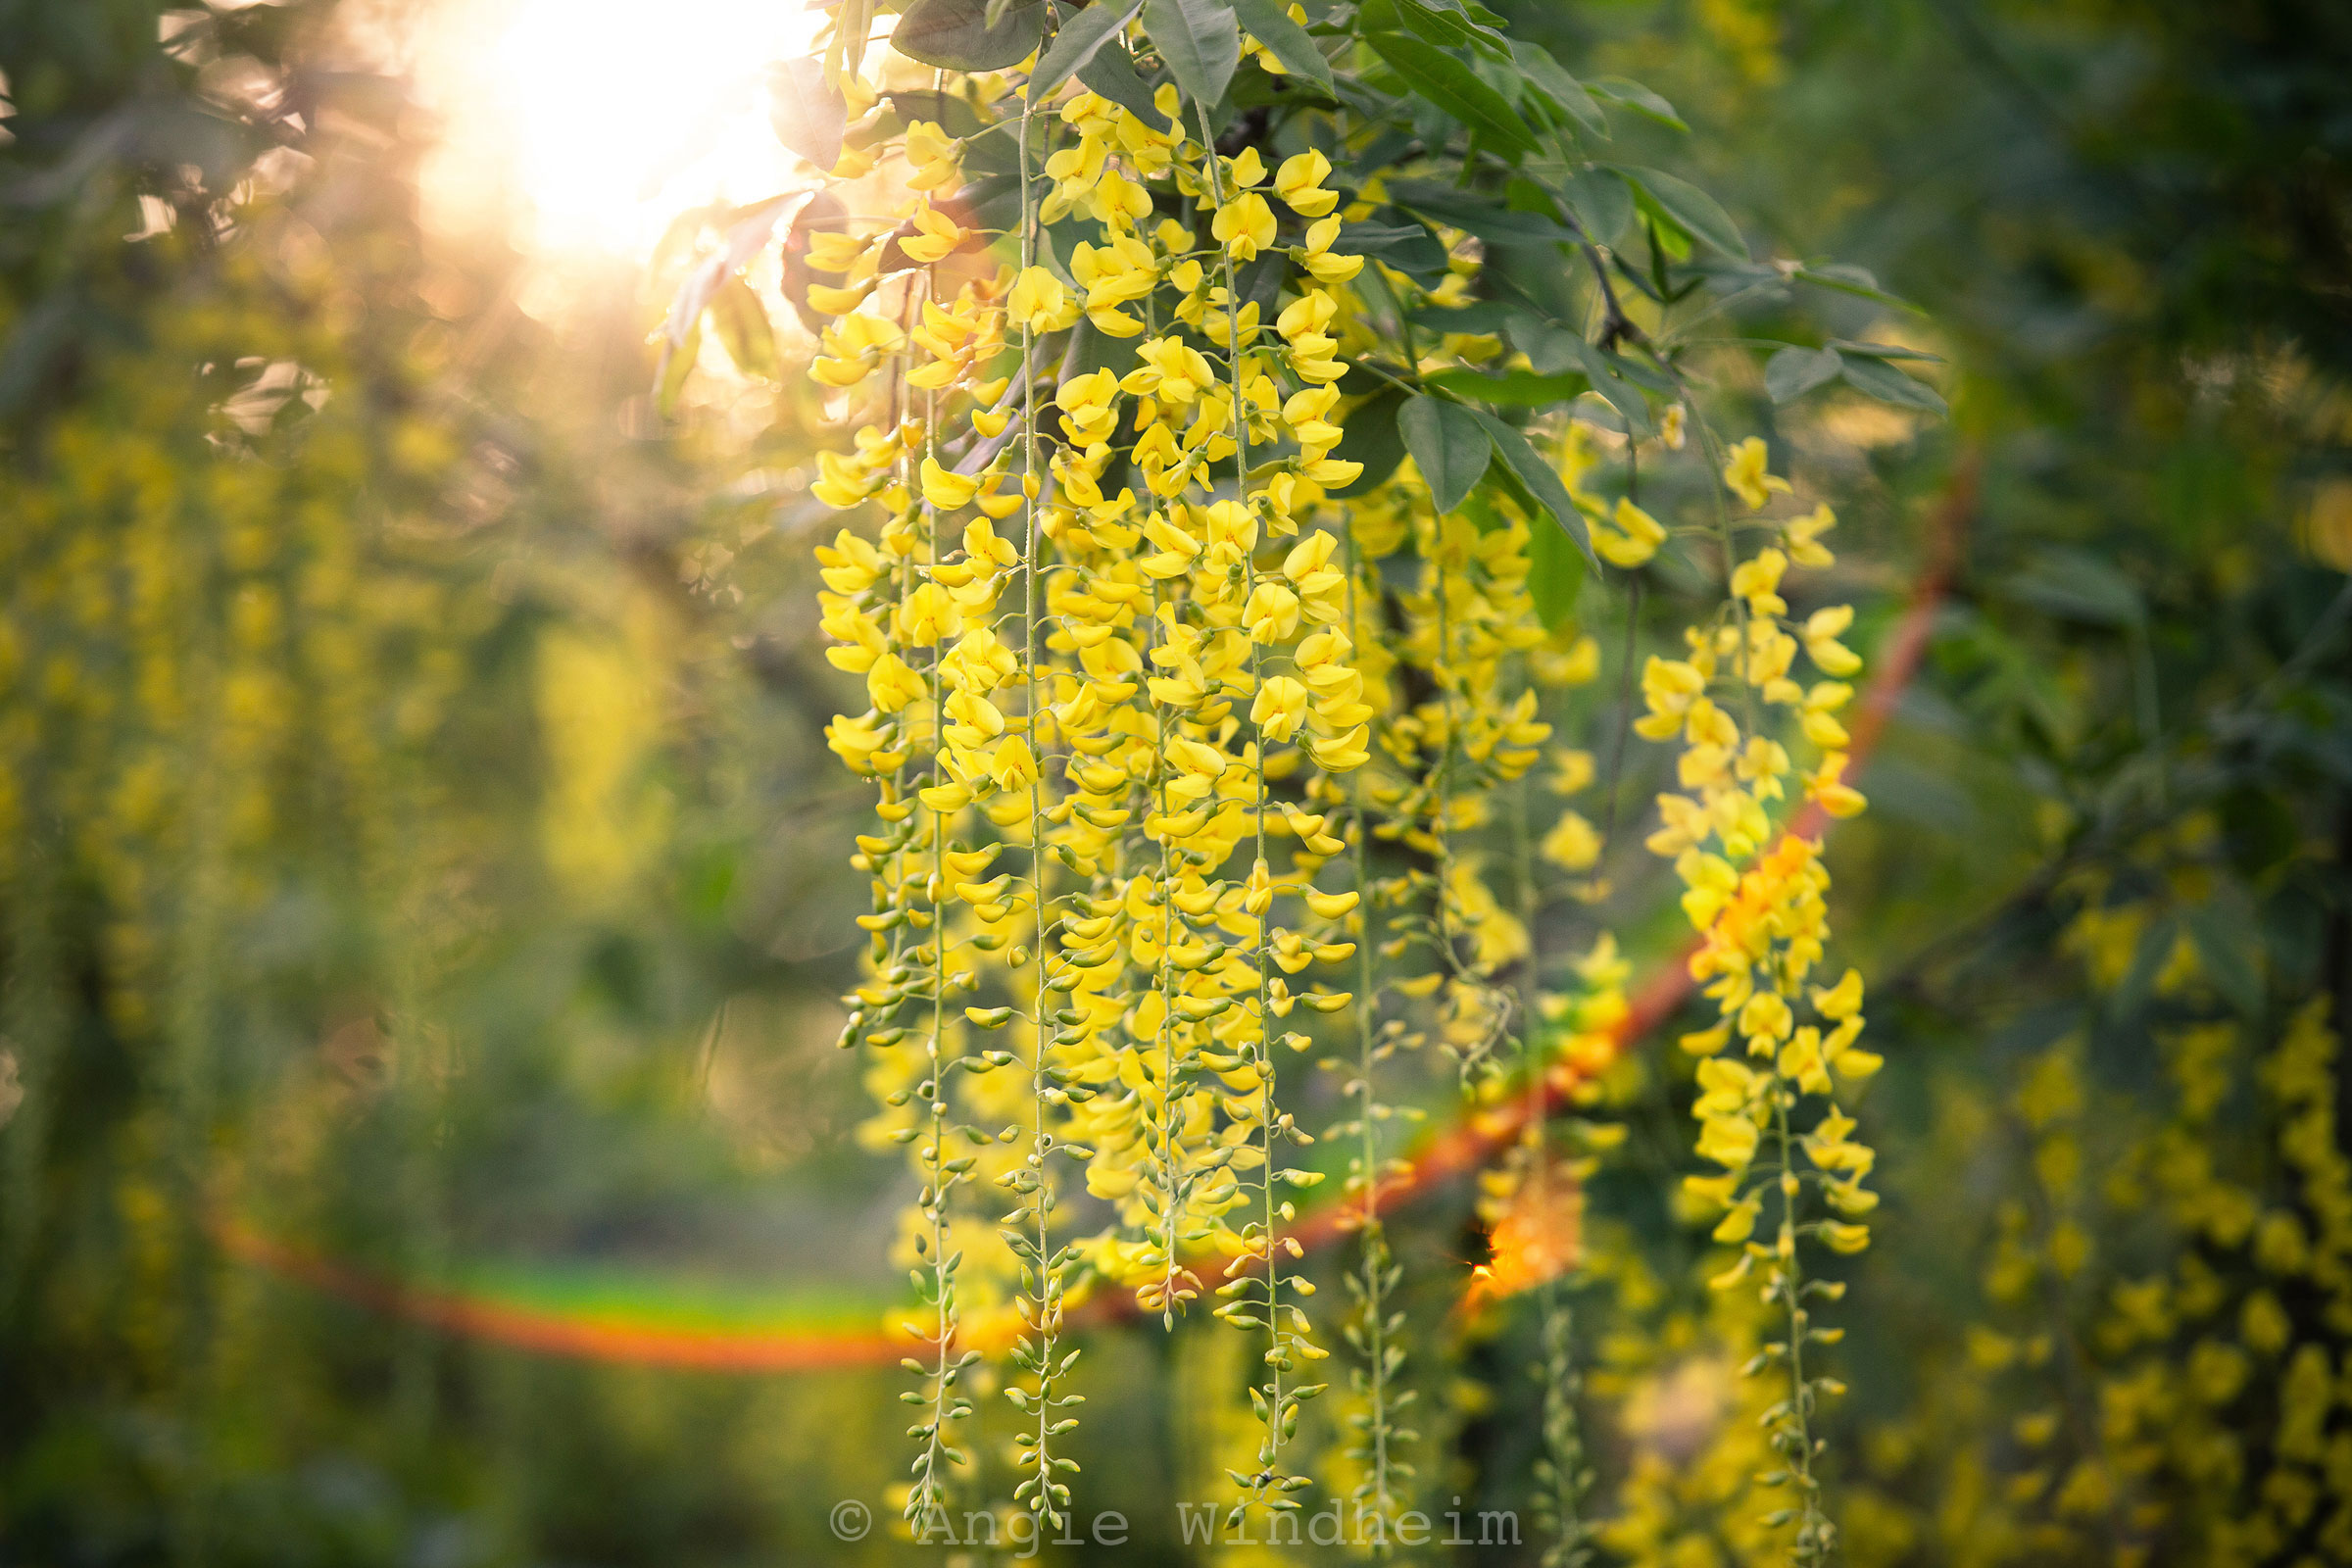 Morning sunlight creates a rainbow flare beneath the blossoms of a Golden Rain Tree.